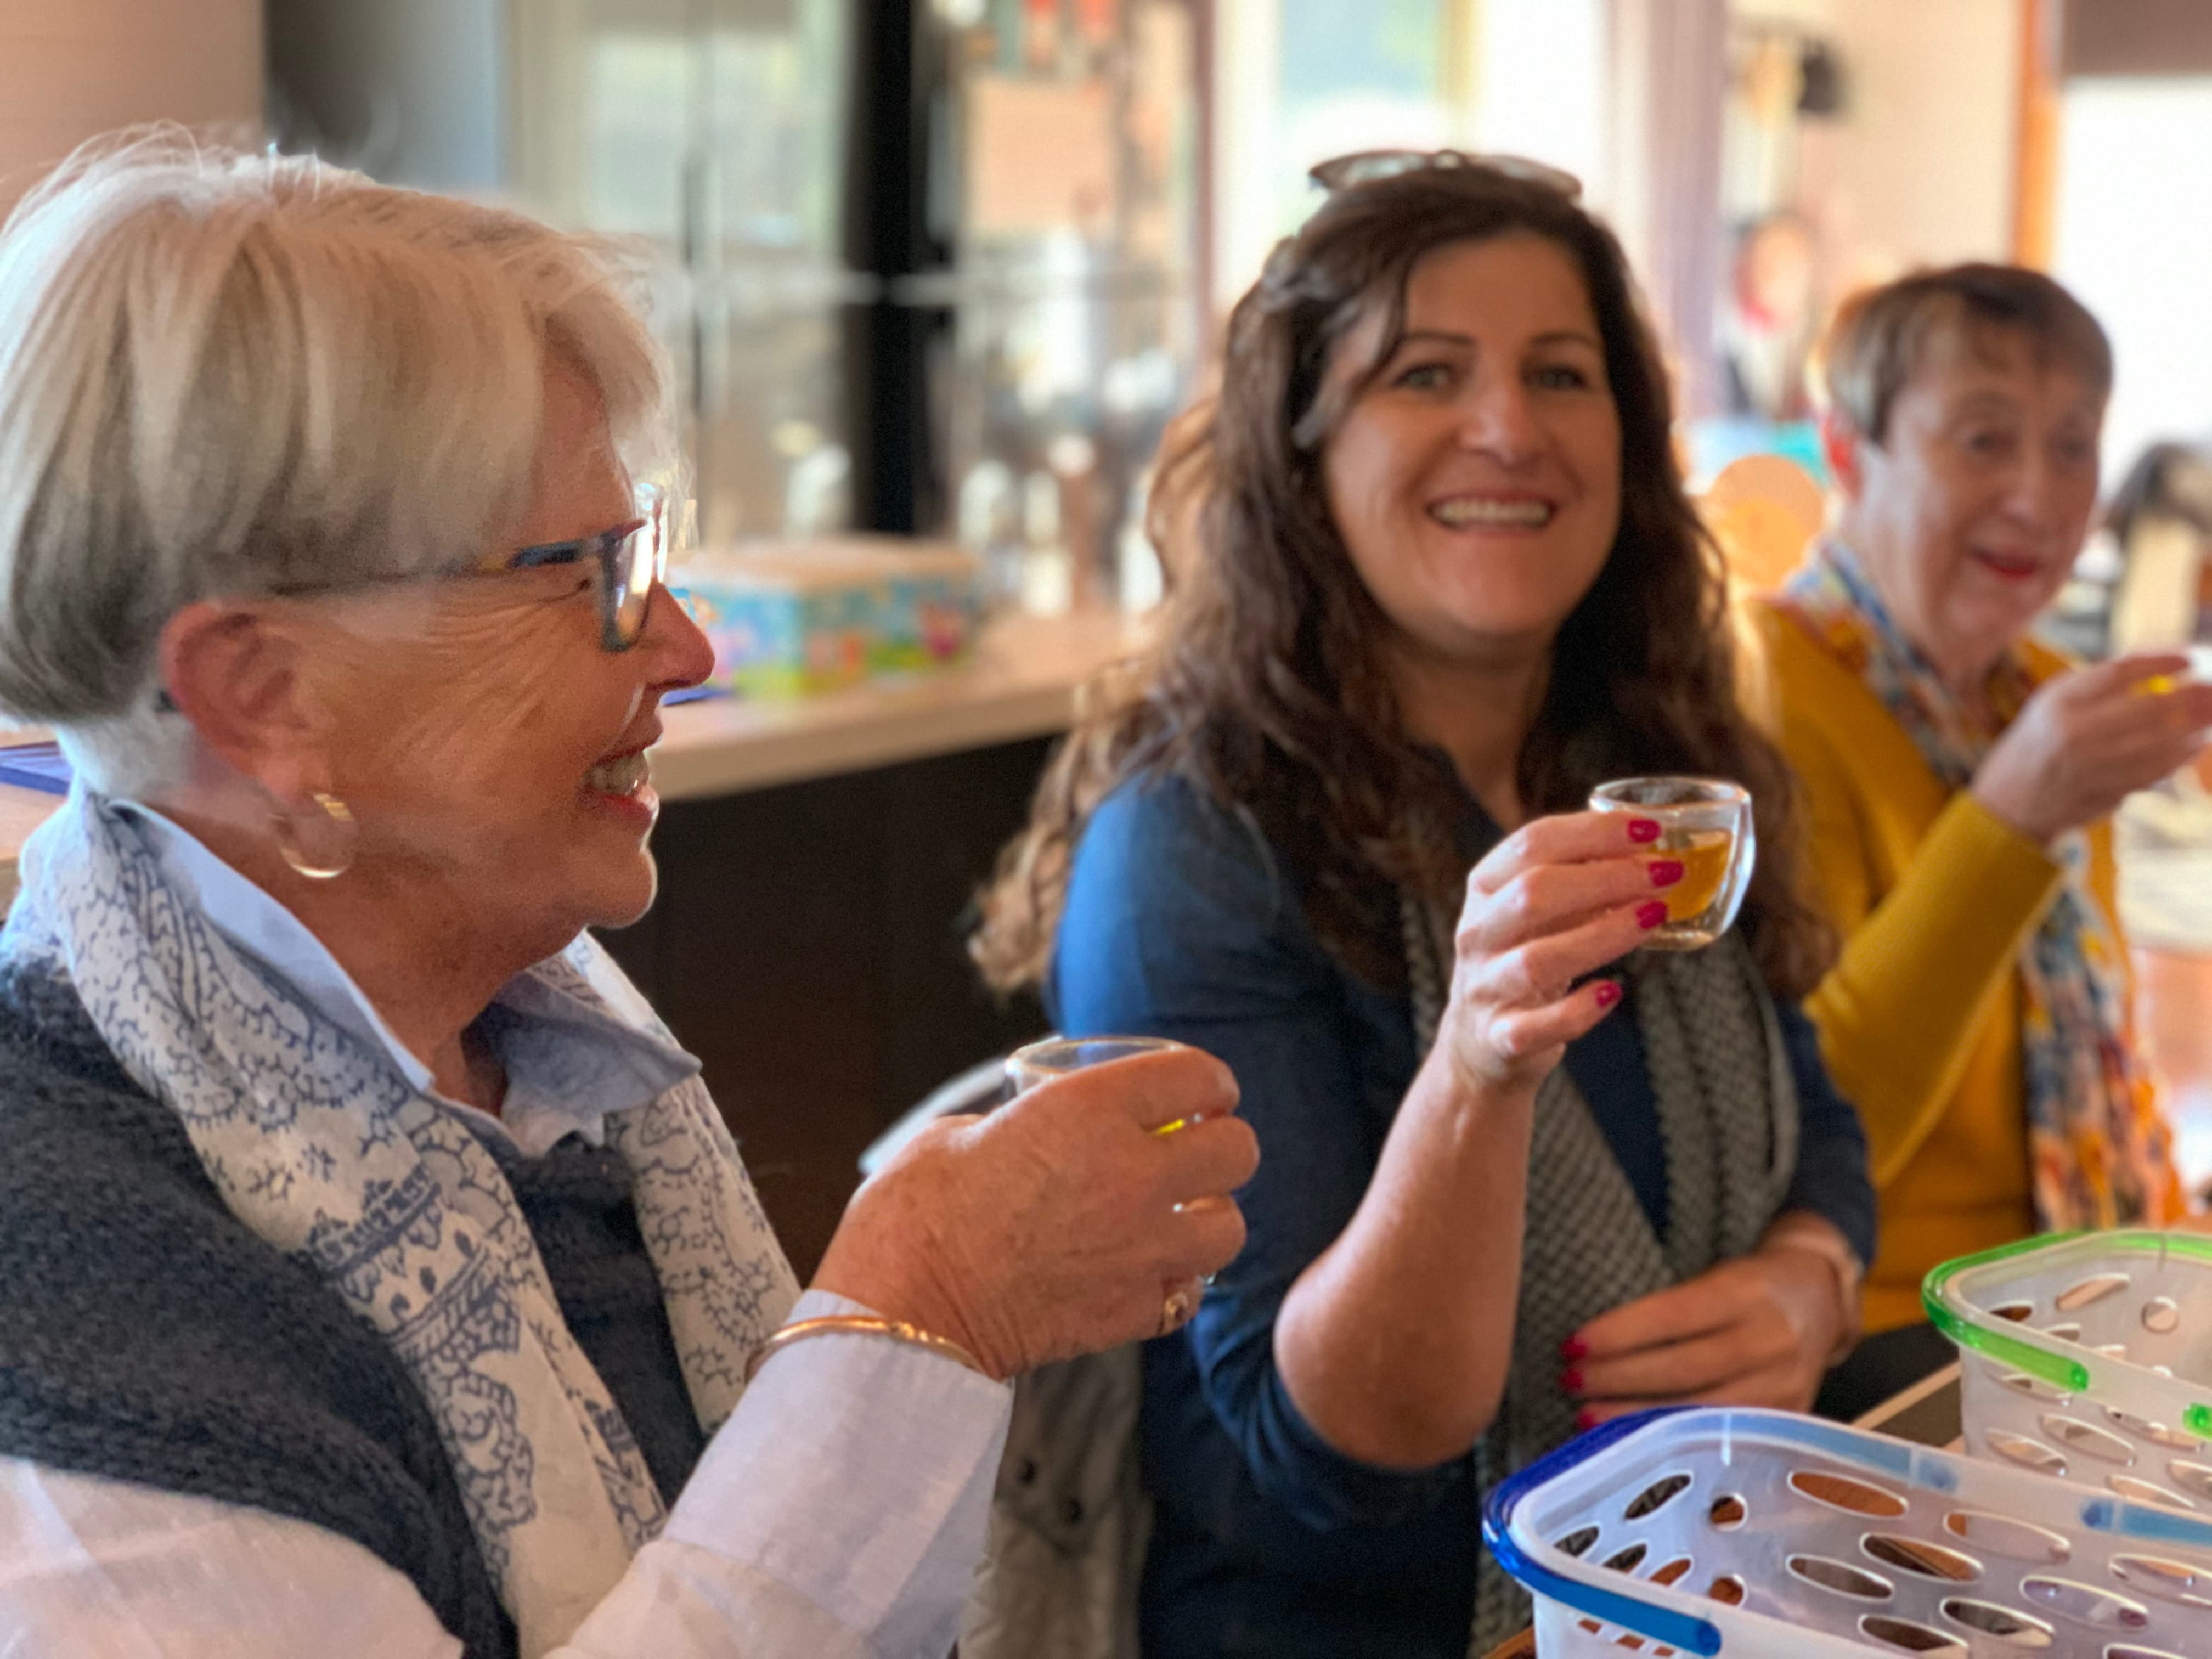 3 ladies drinking saffron tea